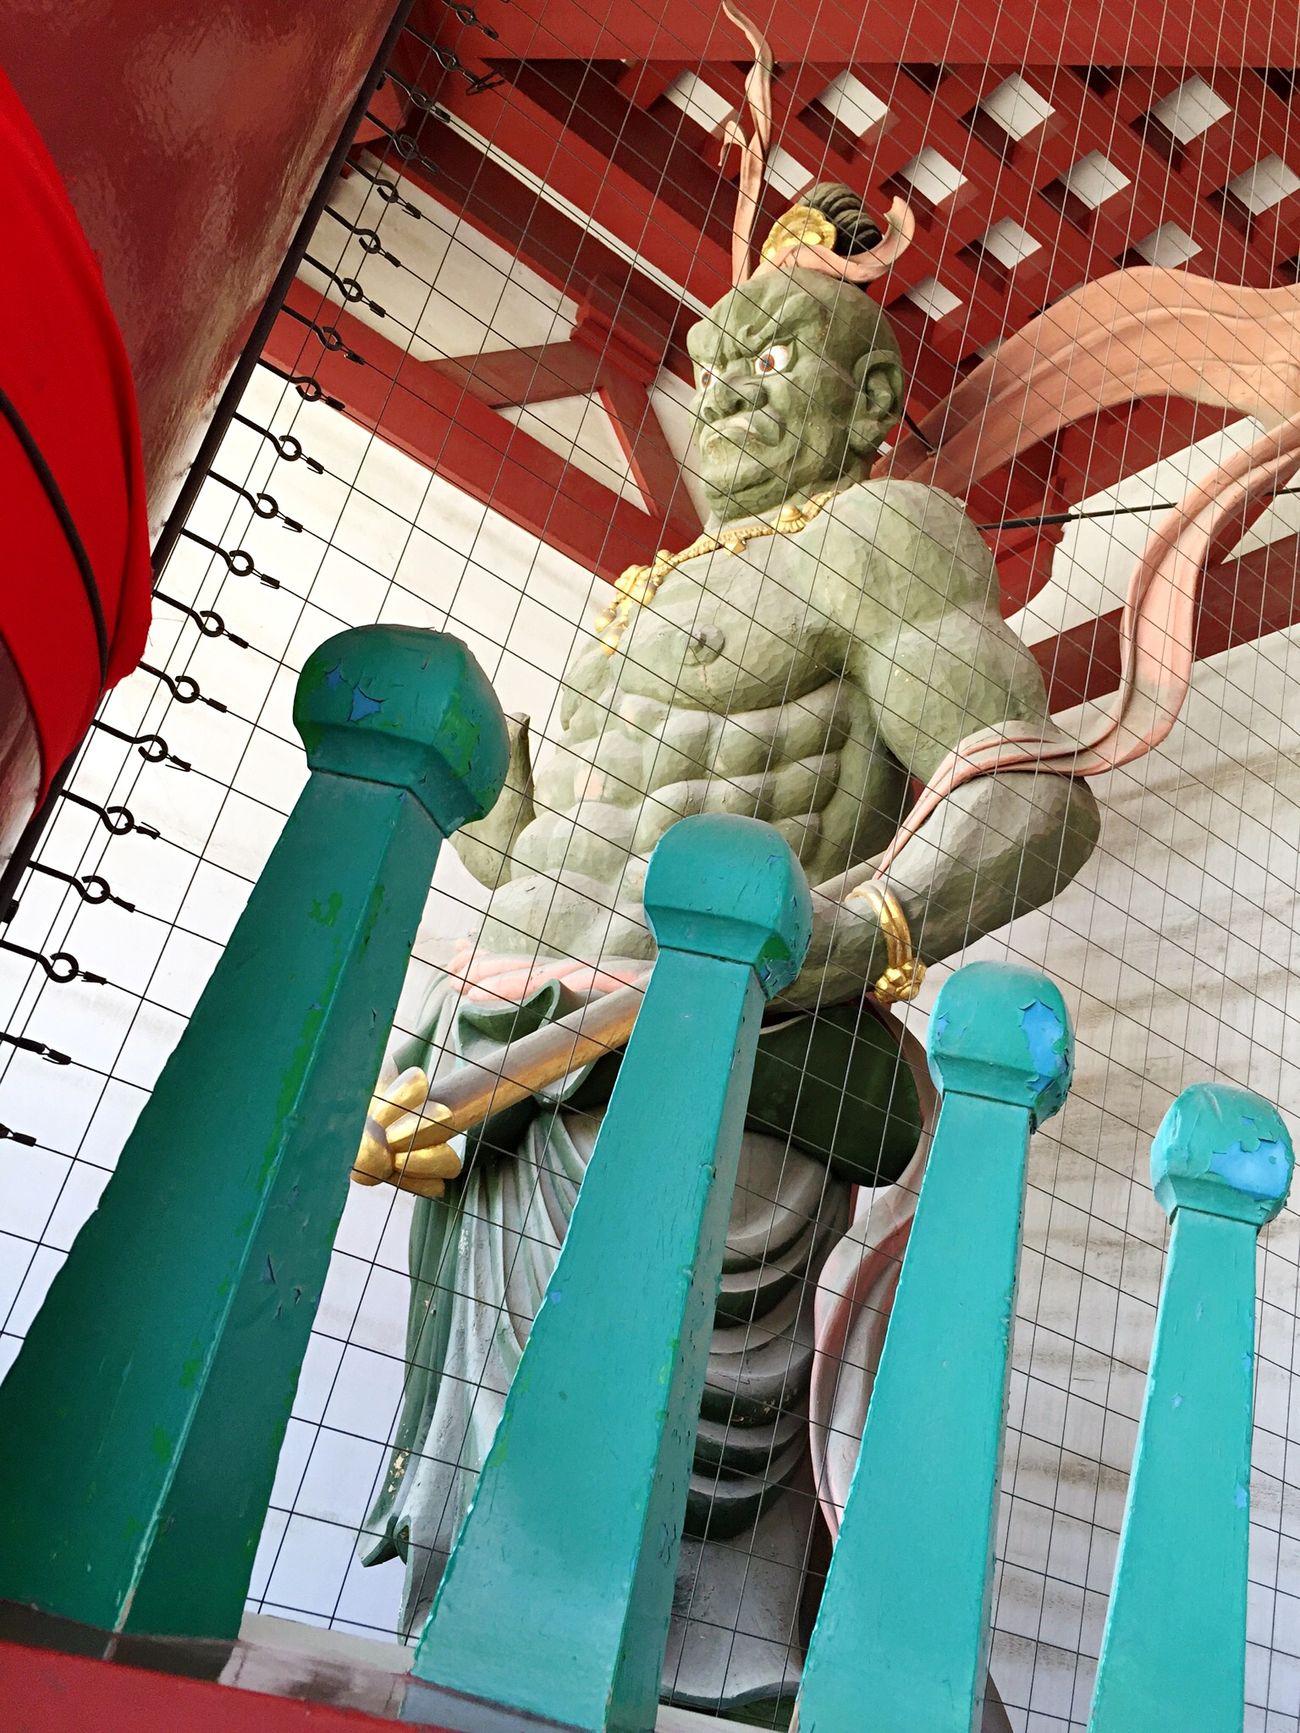 Shitennoji Tennouji OSAKA 四天王寺 天王寺 大阪